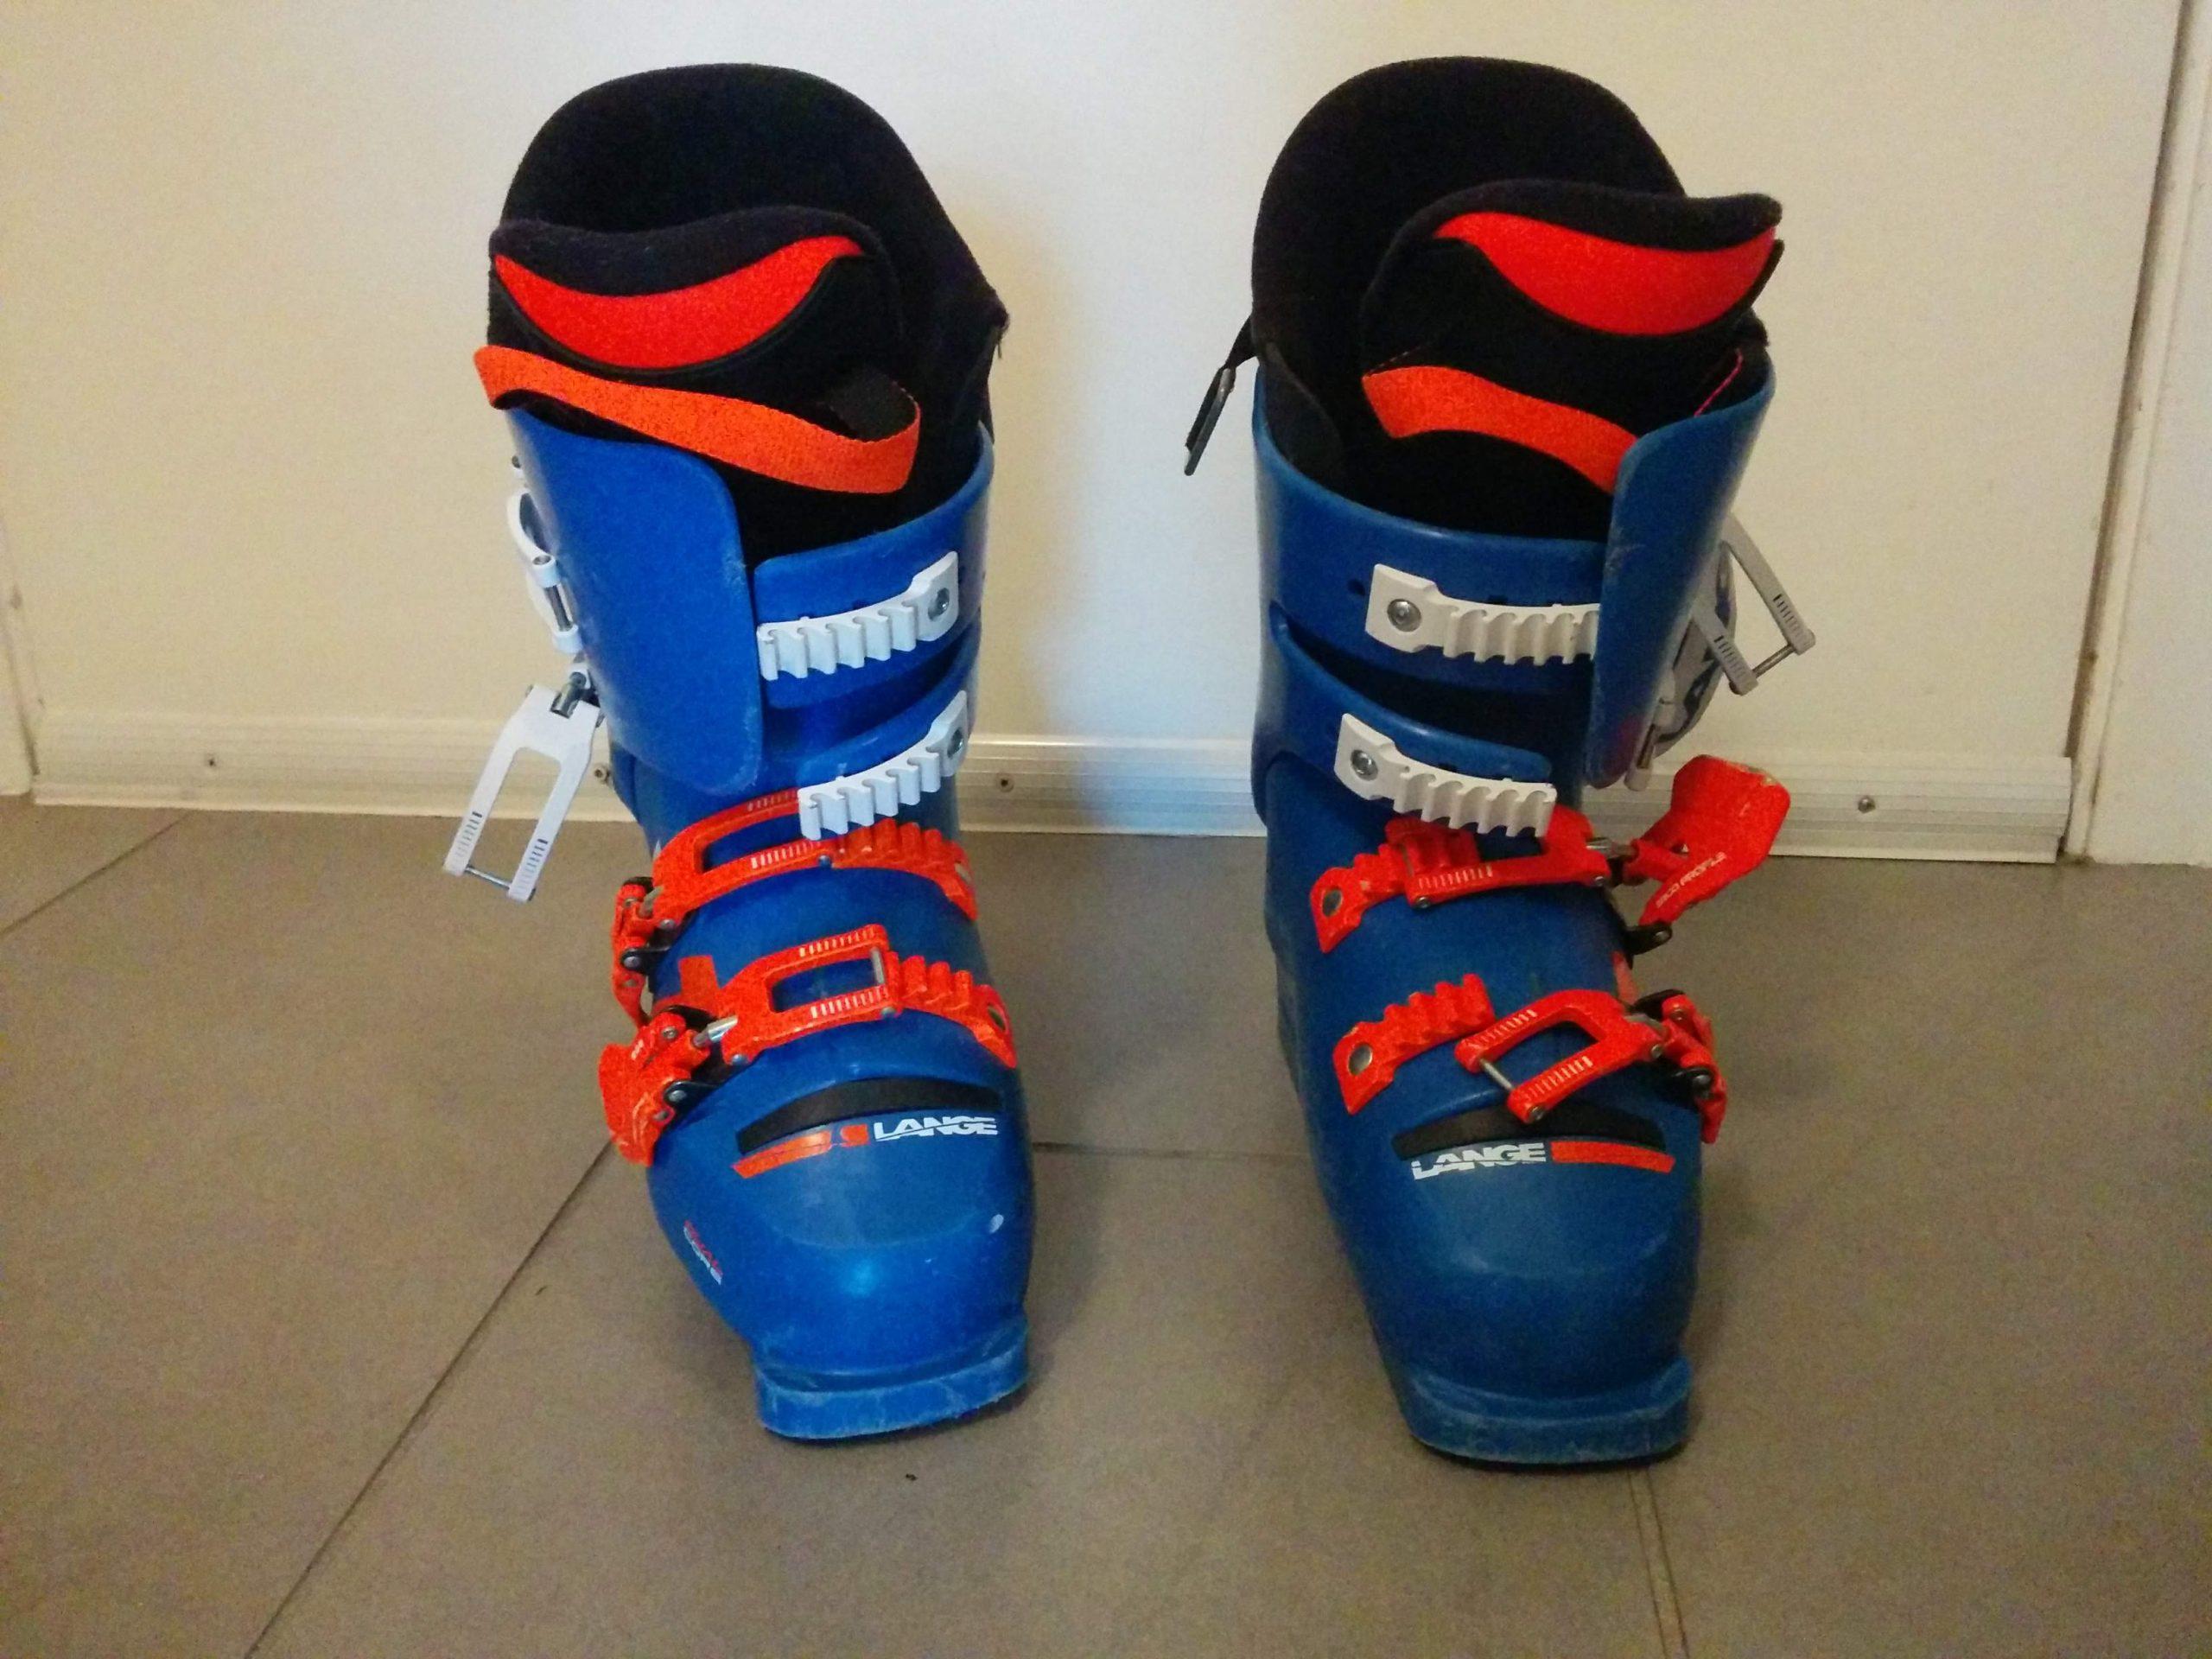 Lange RS70 S.C. size 23.5 racing ski boots